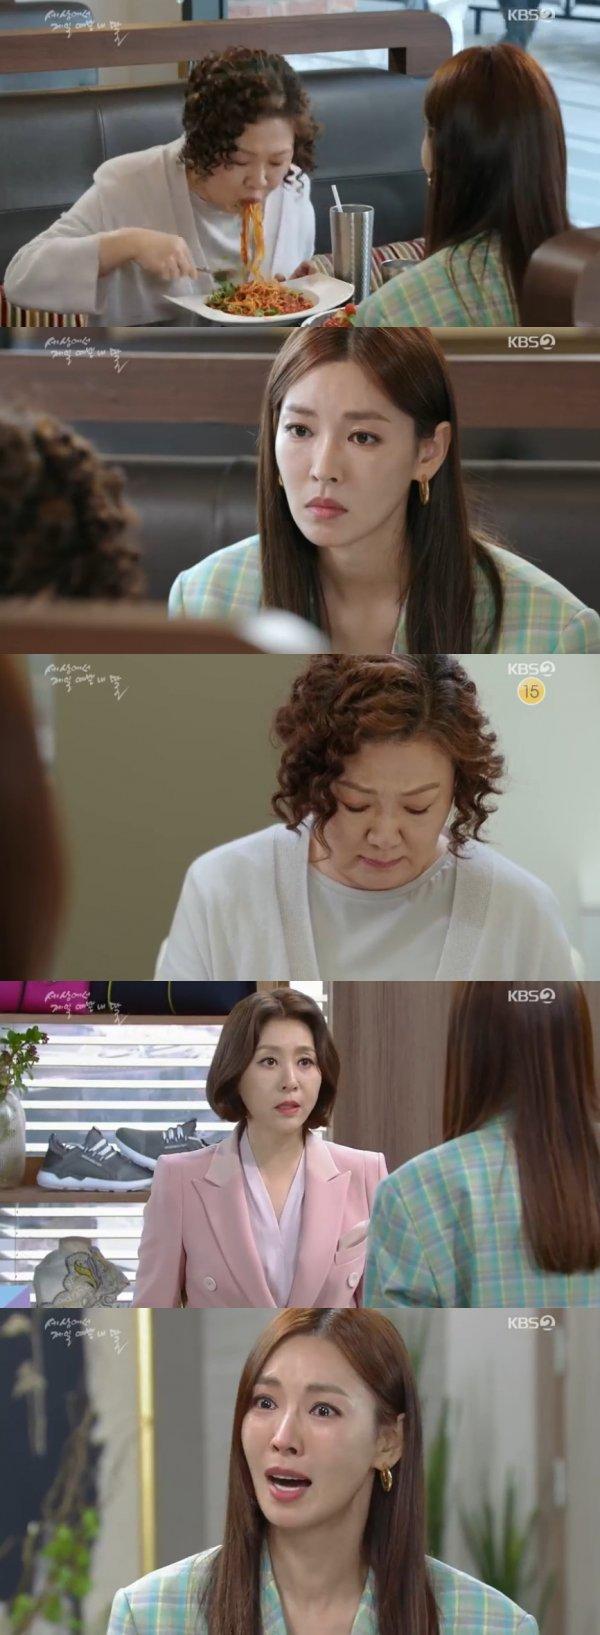 [TV북마크] '세상에서 제일 예쁜 내딸' 김소연, 김해숙 상처 준 최명길에 분노